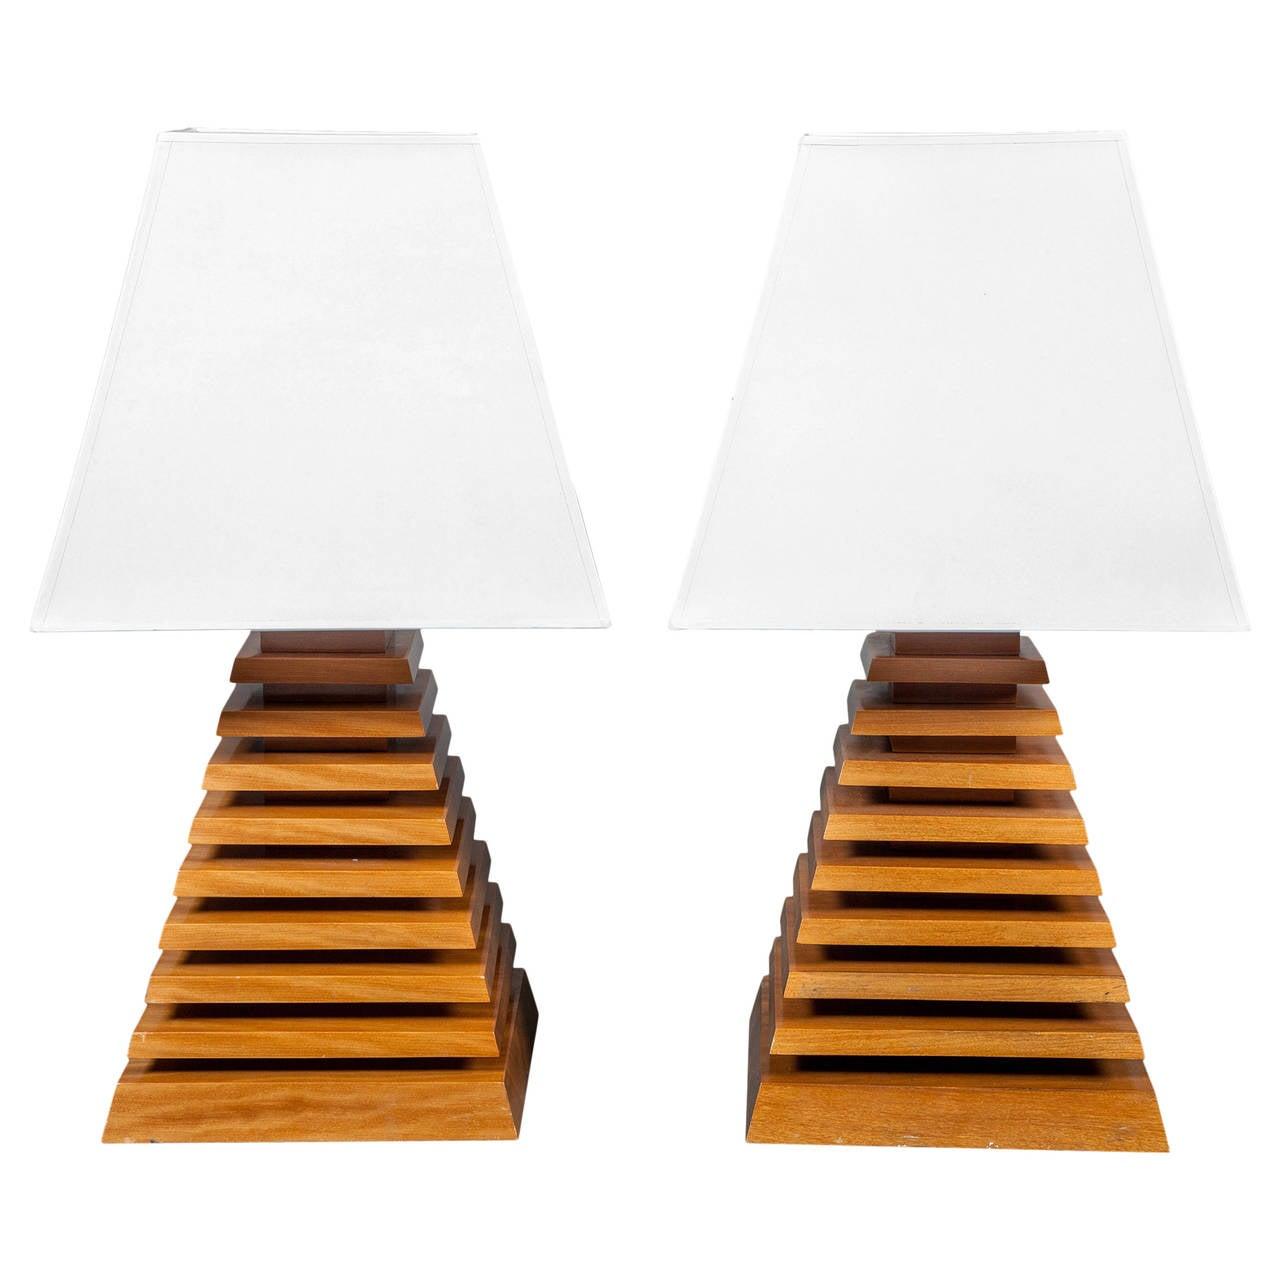 Pair of Wood Pyramid Lamps